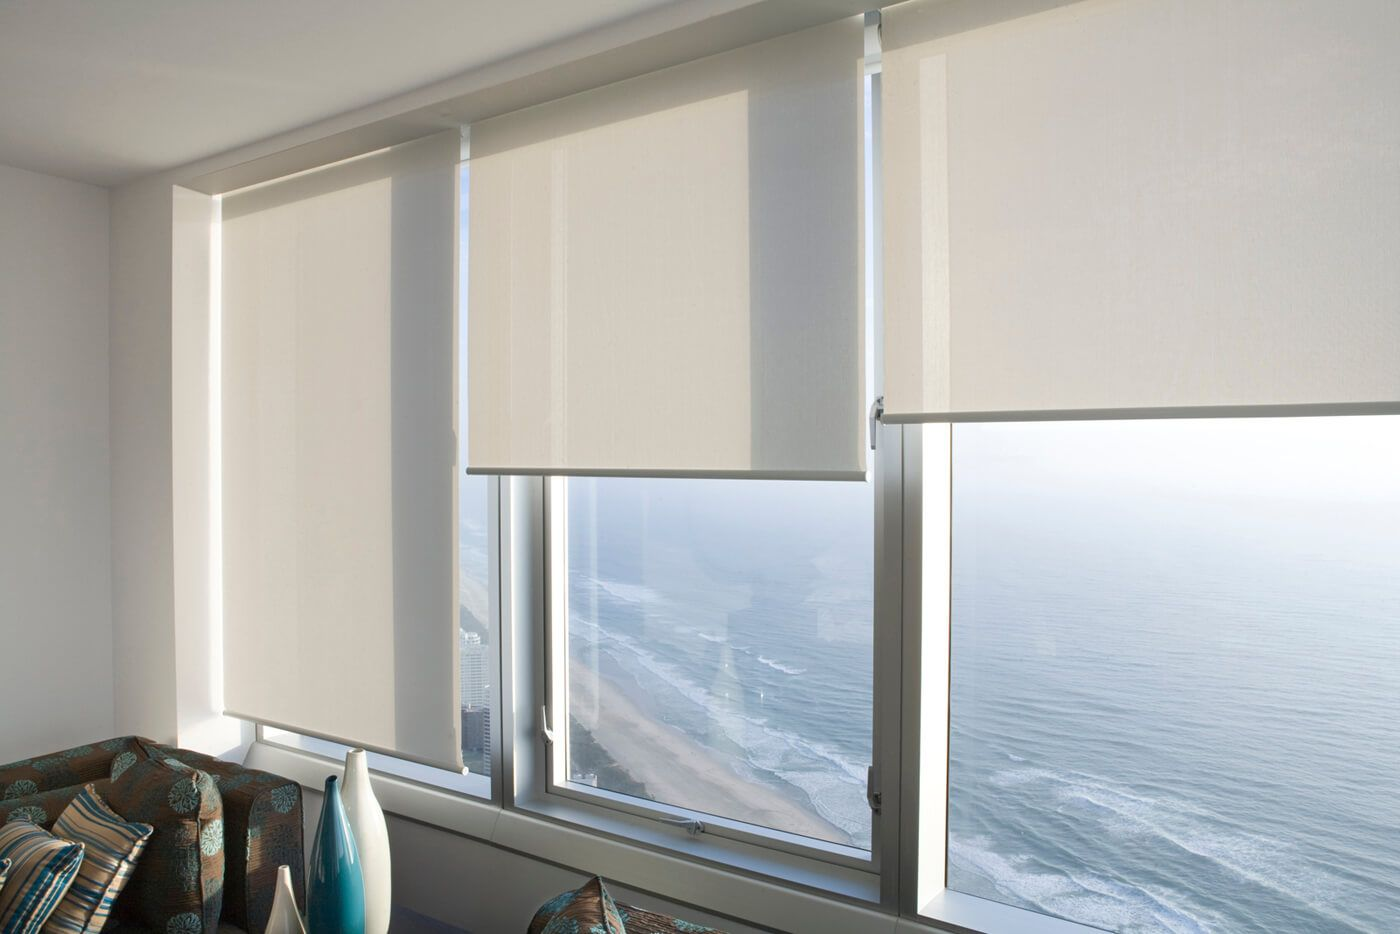 gallery of roller blinds melbourne ~ dachfenster verdunkelung selber